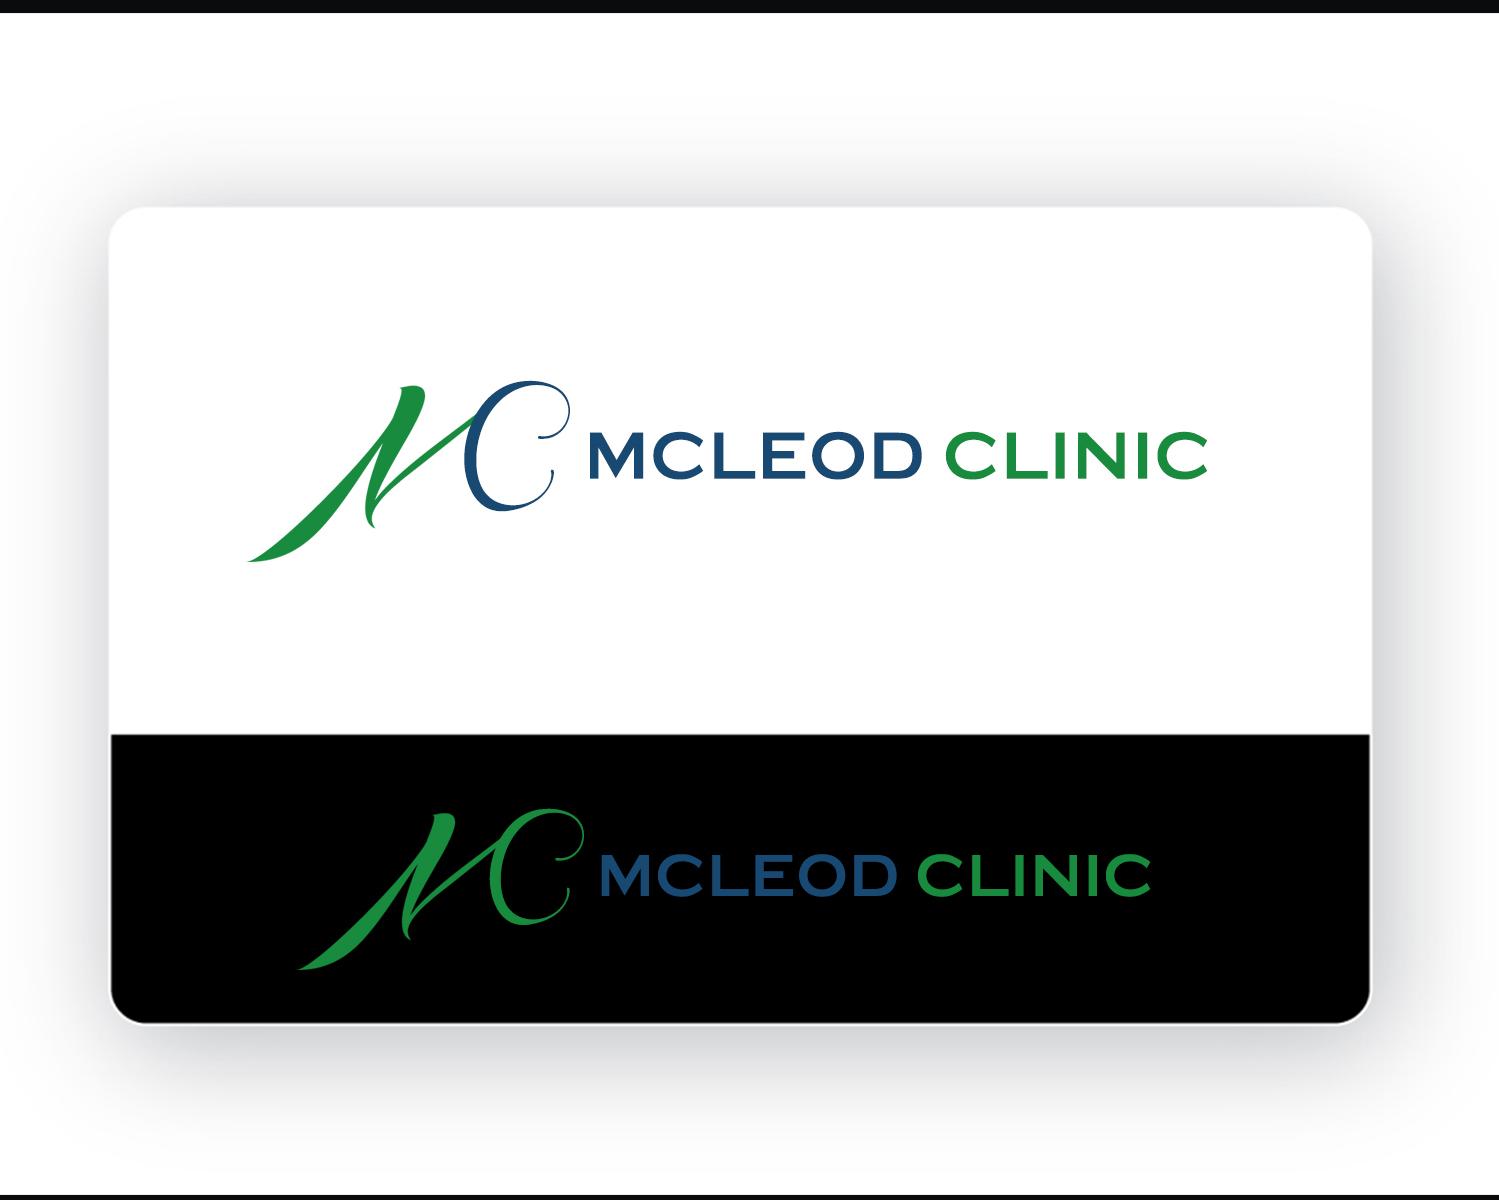 Logo Design by Burhan uddin Sheik - Entry No. 20 in the Logo Design Contest Creative Logo Design for McLeod Clinic.